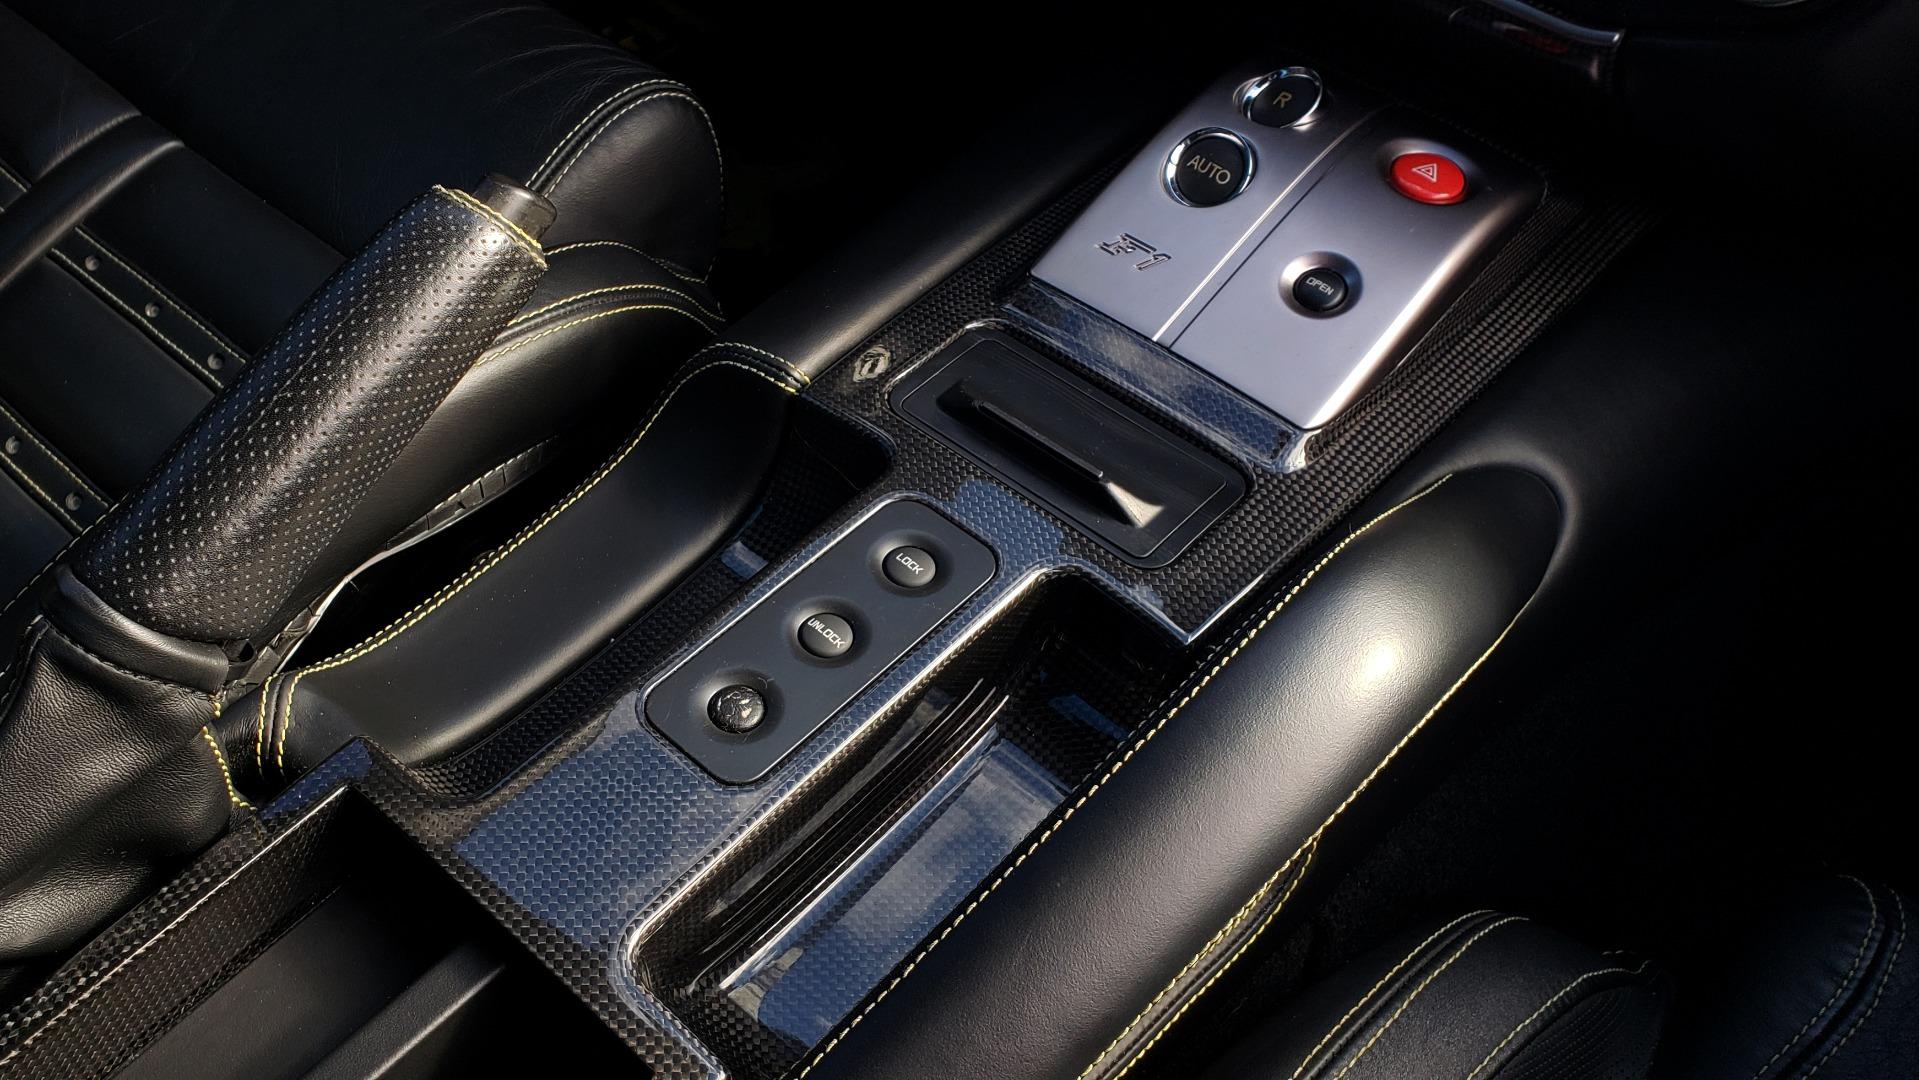 Used 2007 Ferrari 599 GTB FIORANO HGTE / V12 / F1 TRANS / NAV / BOSE / CUSTOM WHEELS for sale $109,999 at Formula Imports in Charlotte NC 28227 108